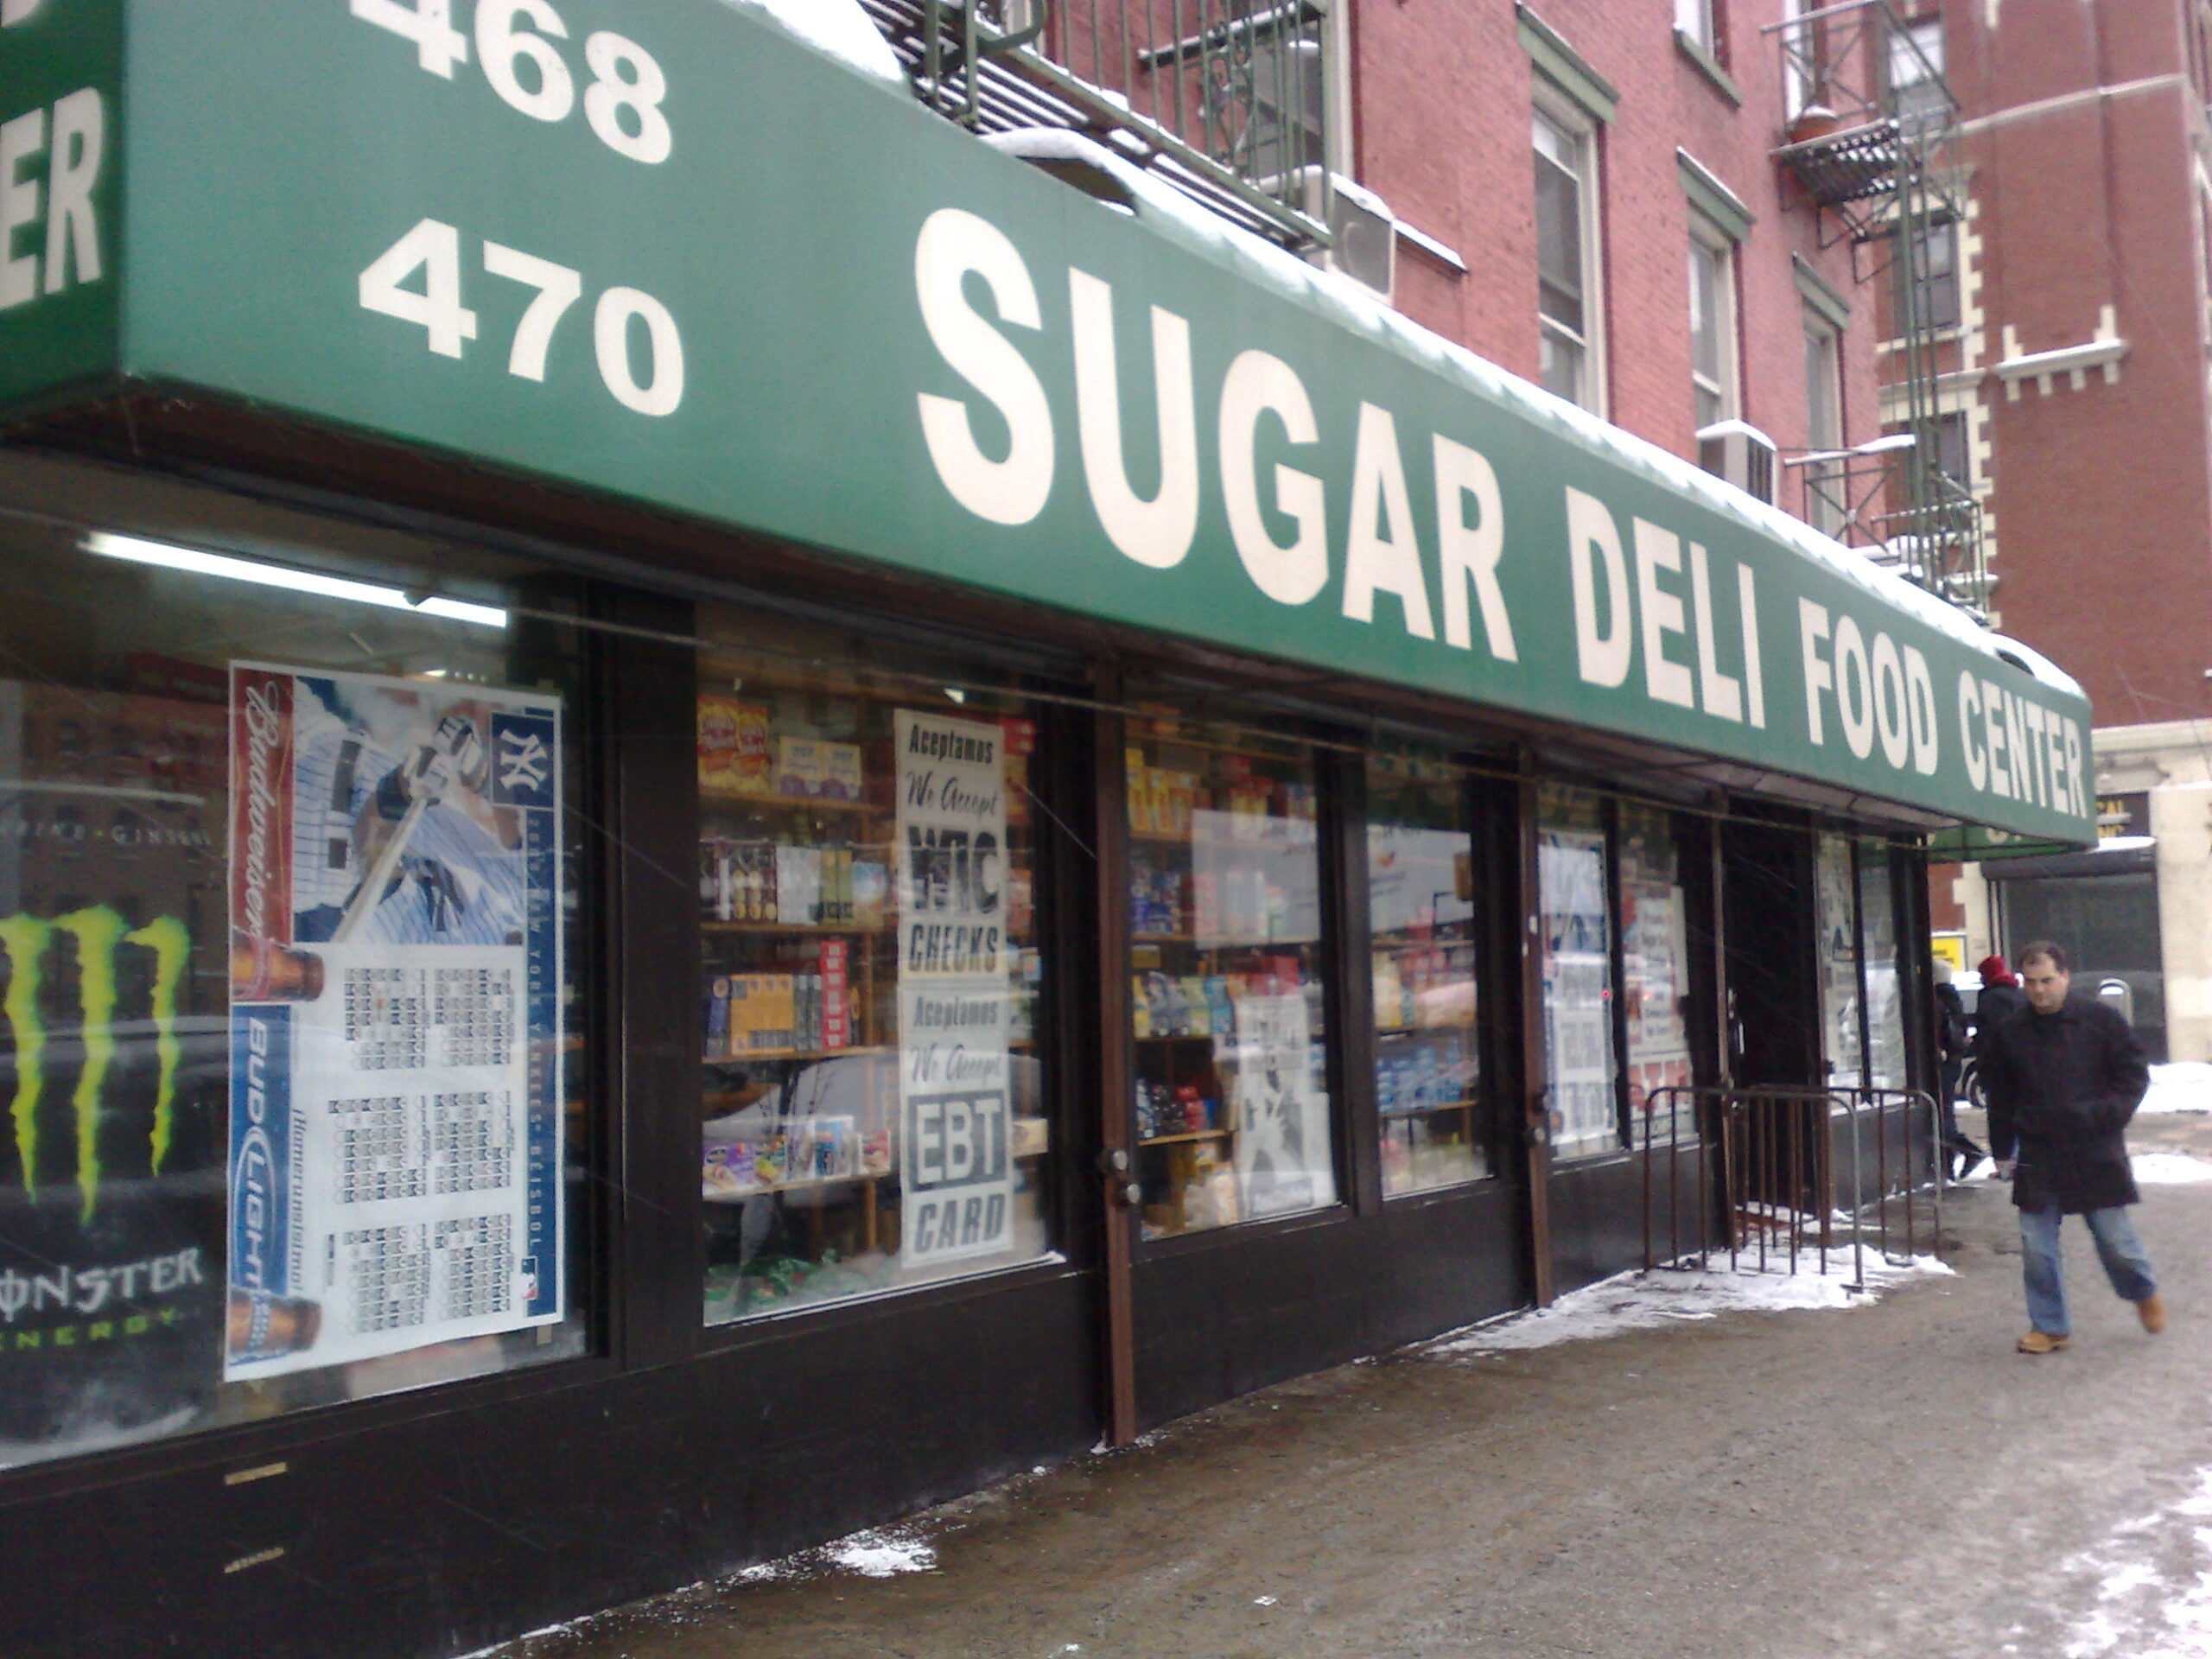 Sugar Deli Food Center